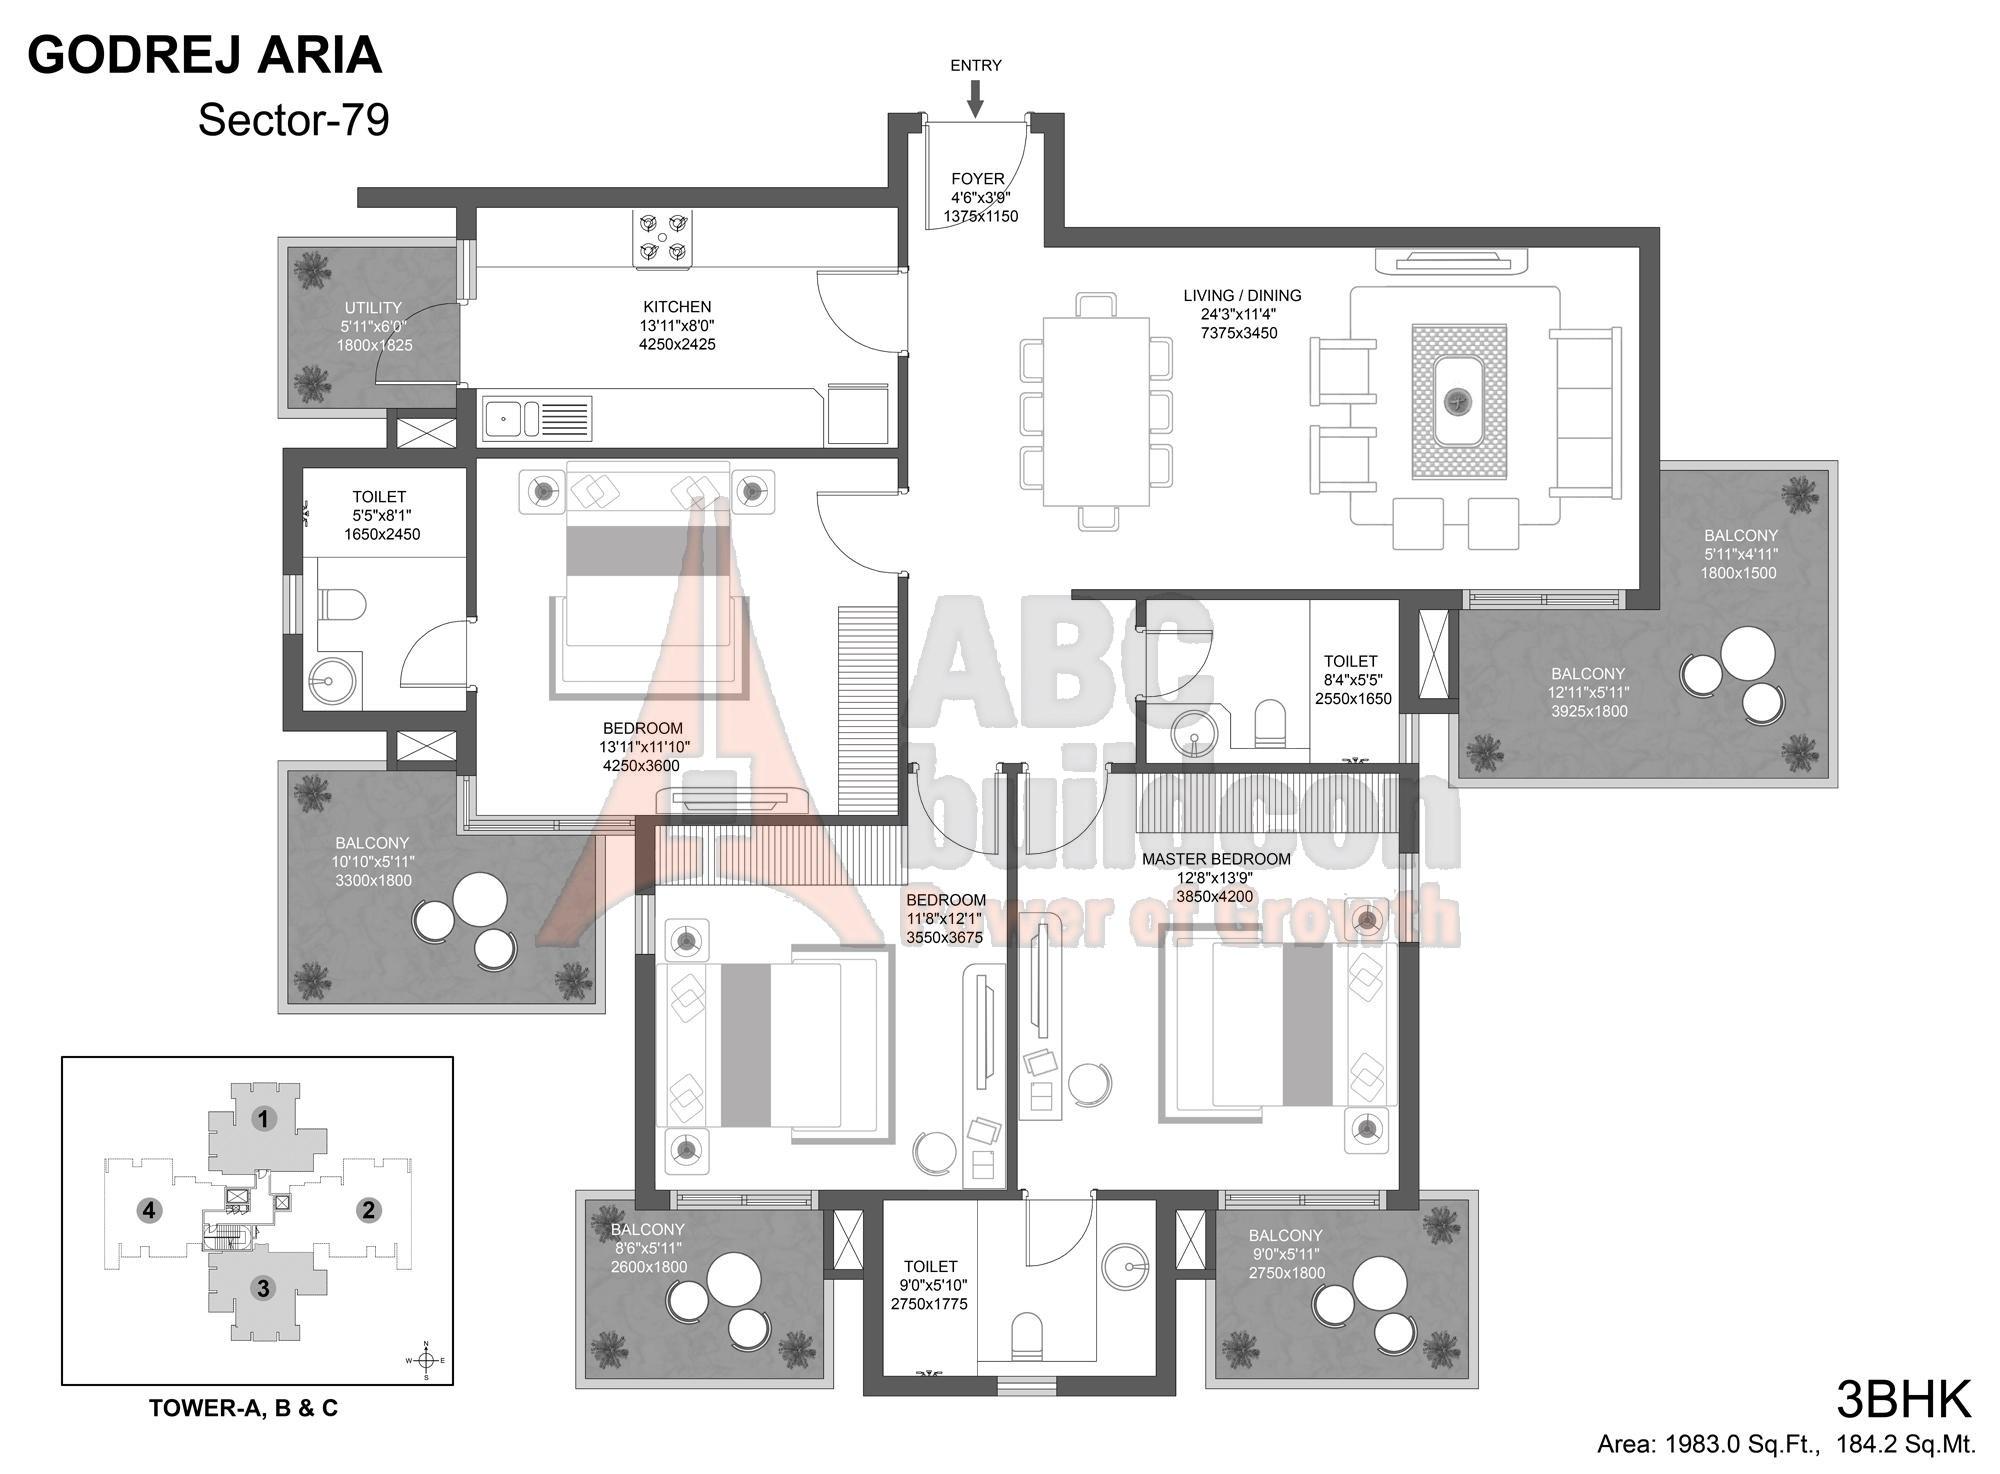 Godrej aria sector 79 gurgaon abc buildcon for Landcraft homes floor plans